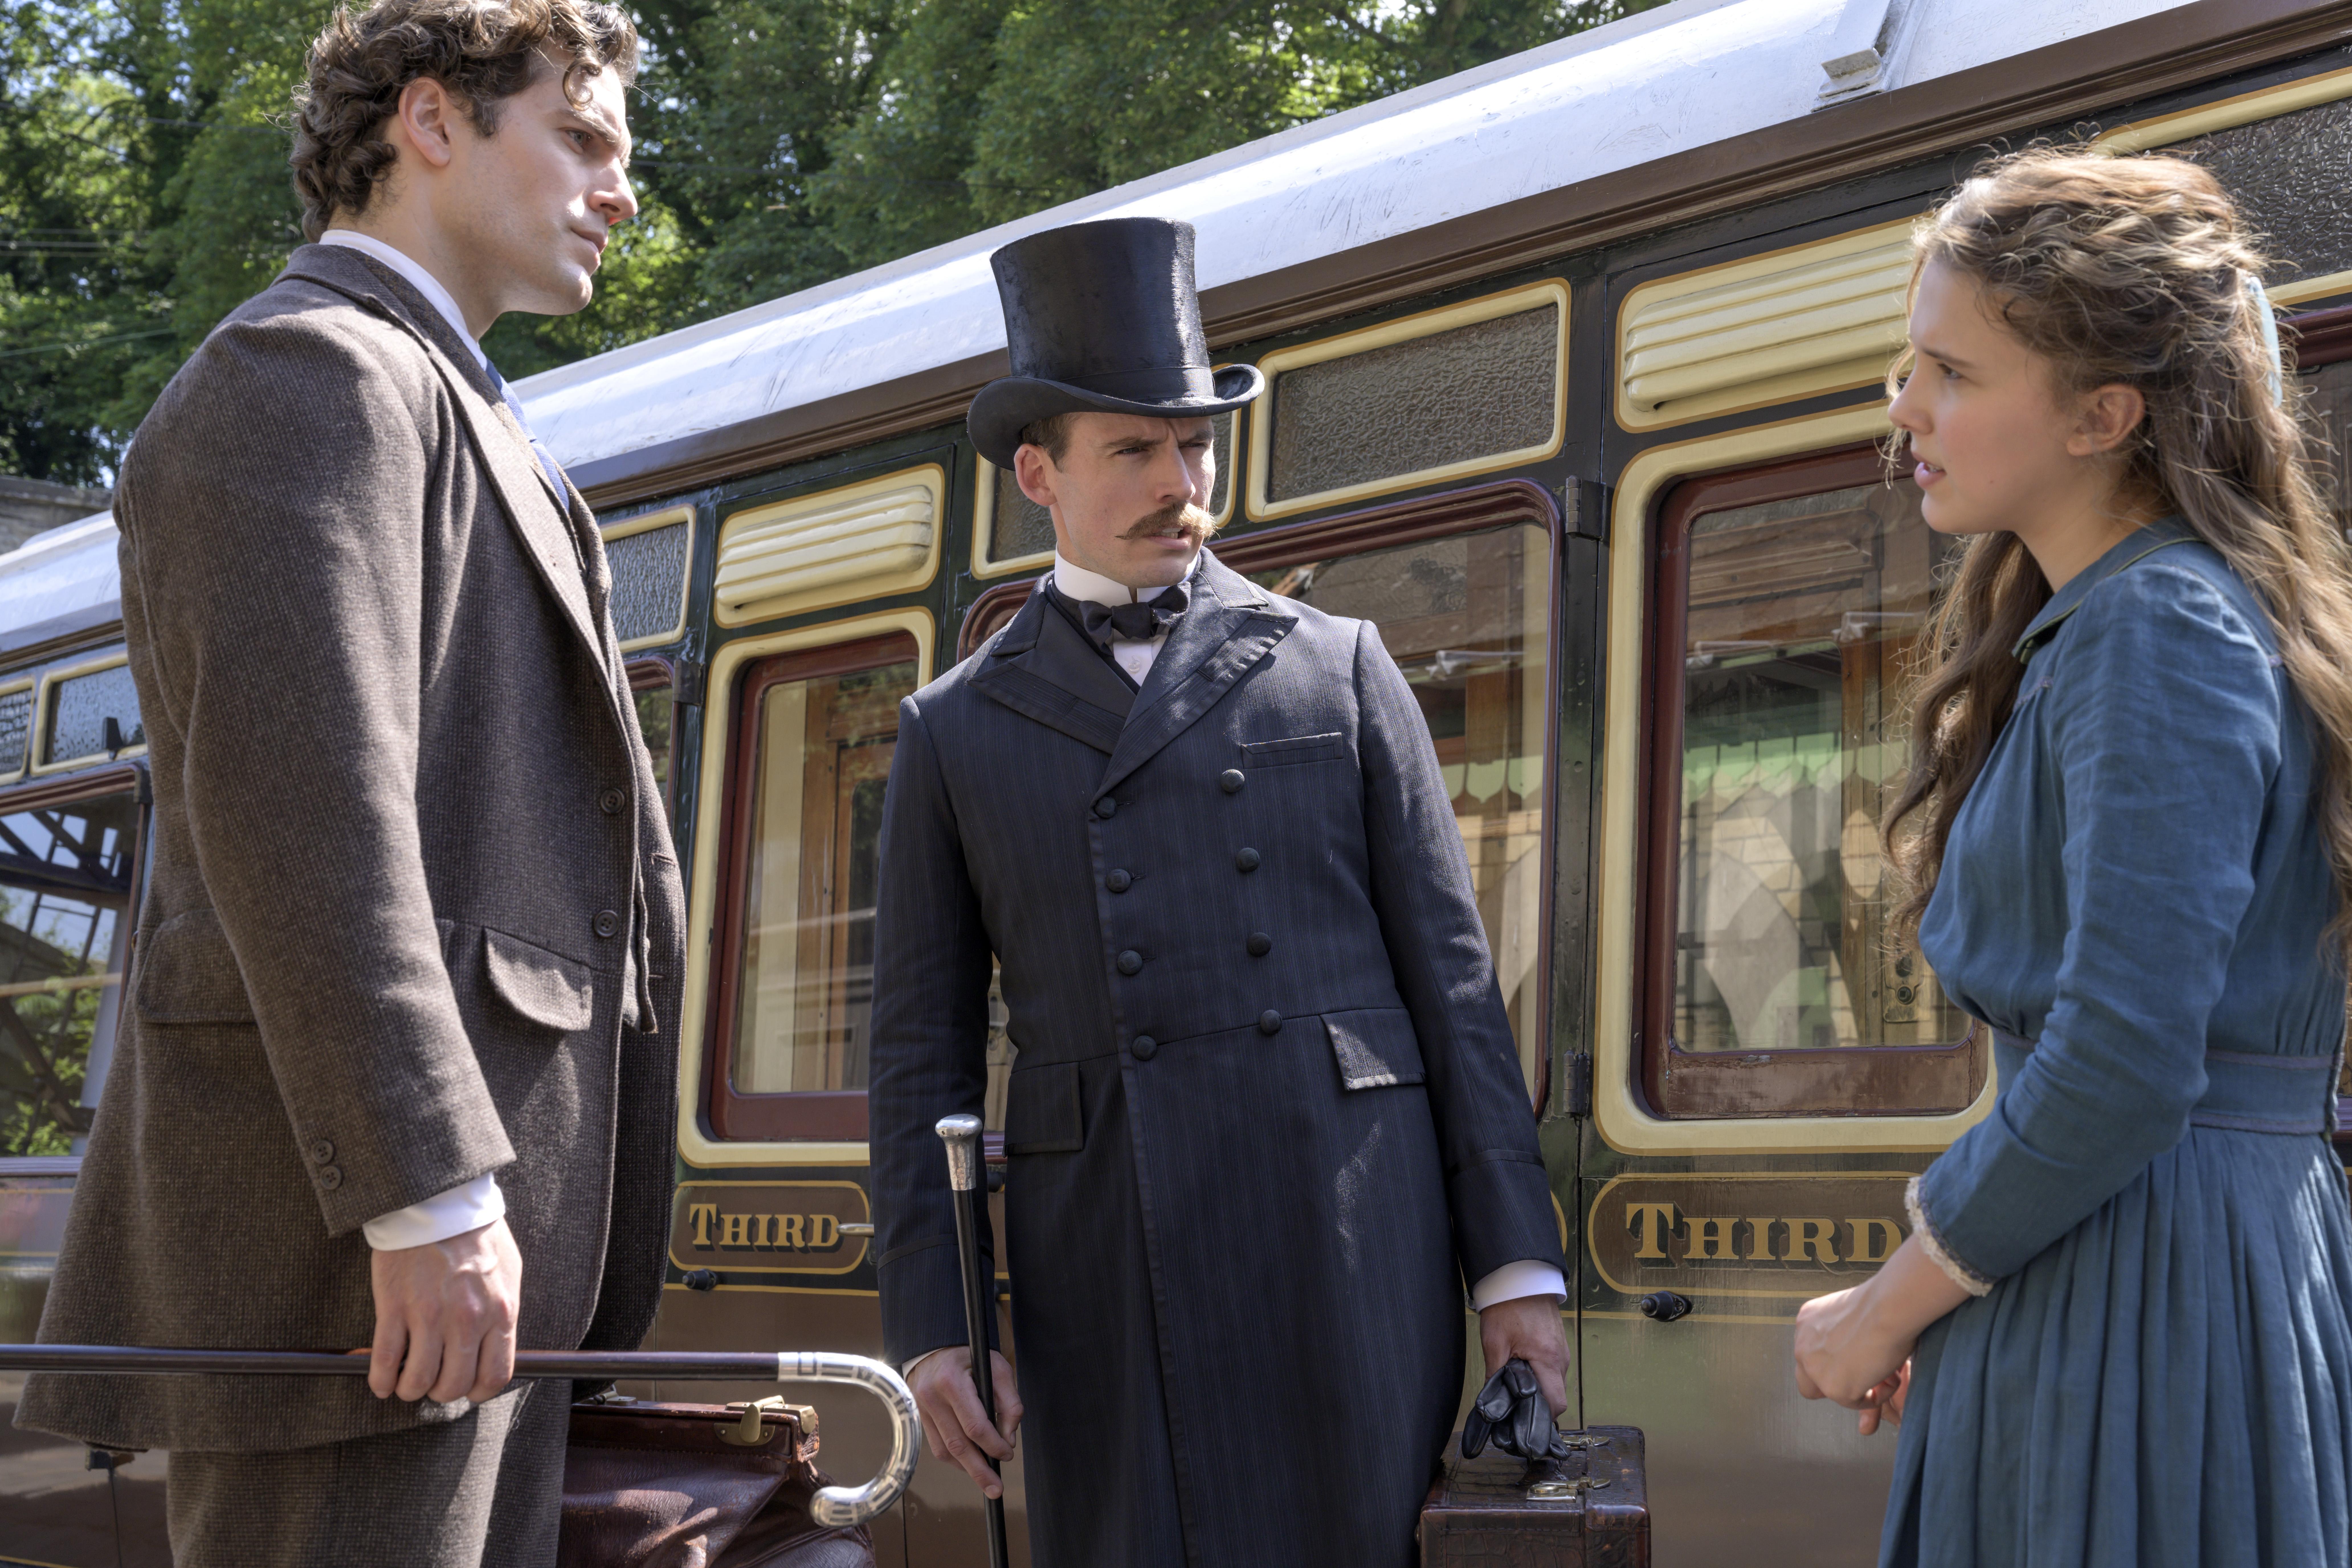 Sherlock (Henry Cavill), Mycroft (Sam Claflin), and Enola (Millie Bobby Brown) form the dysfunctional Holmes clan of Nancy Springer's books